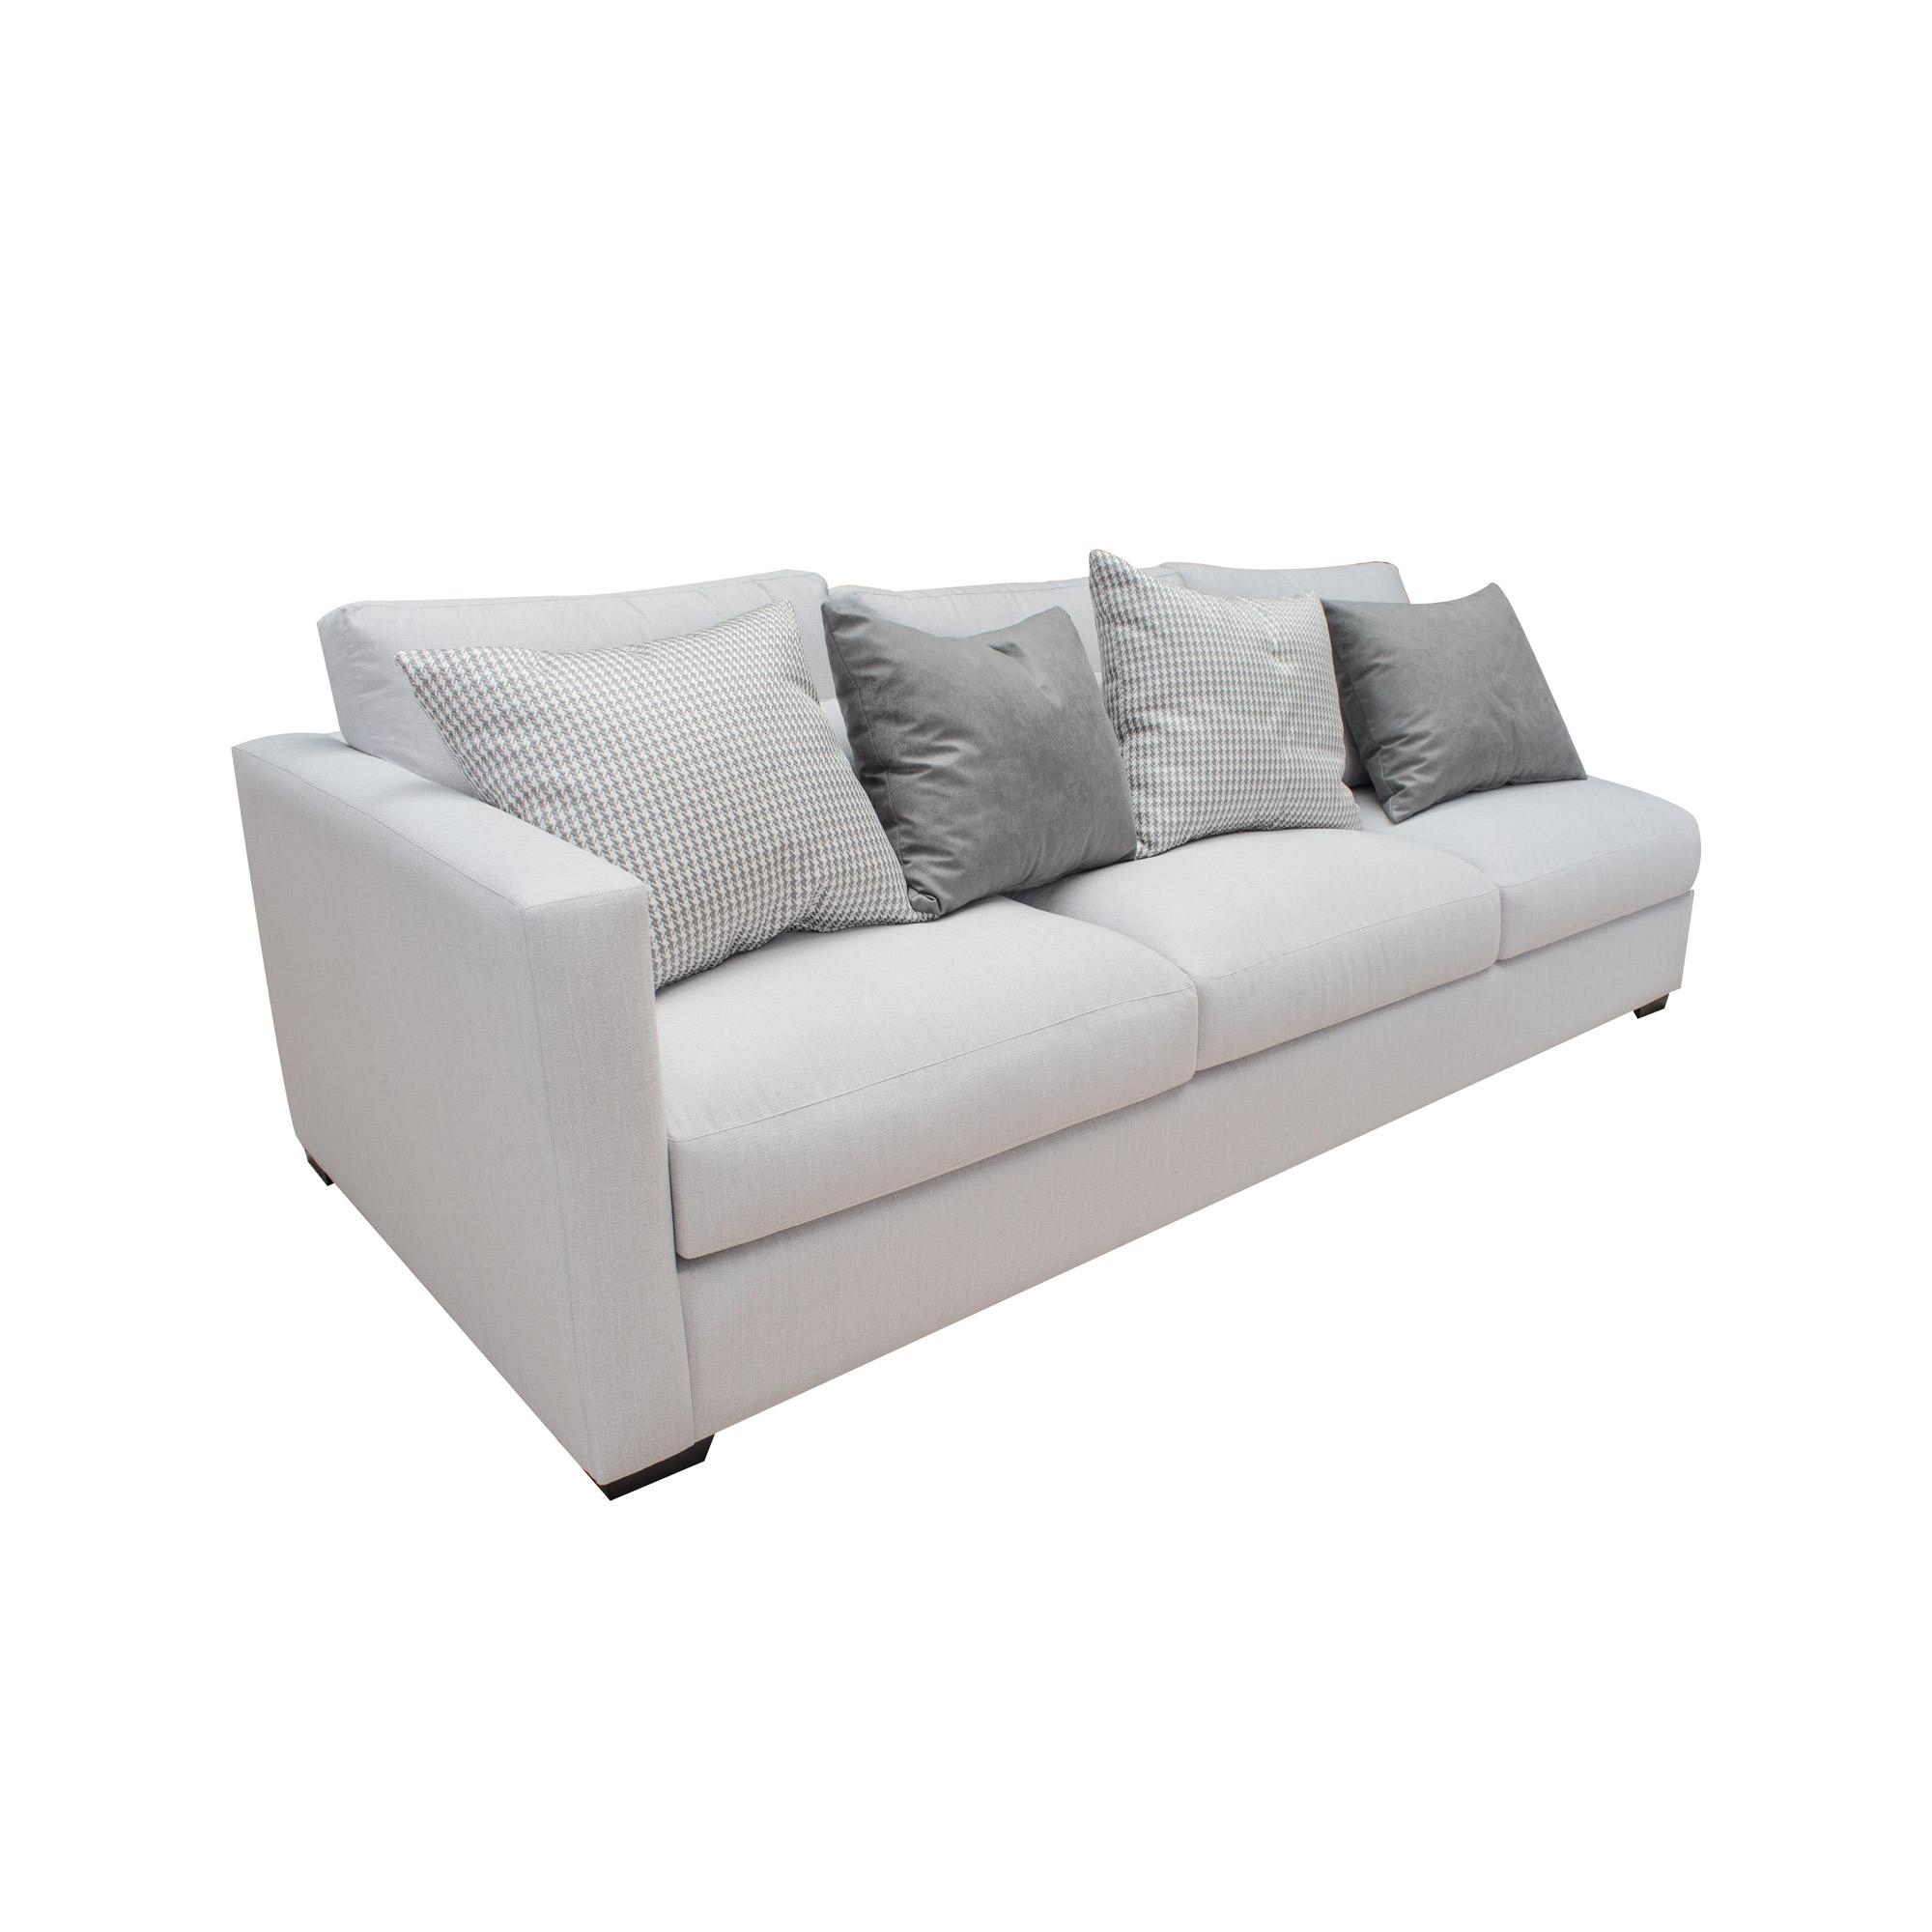 sofa-dante-izquierdo-2